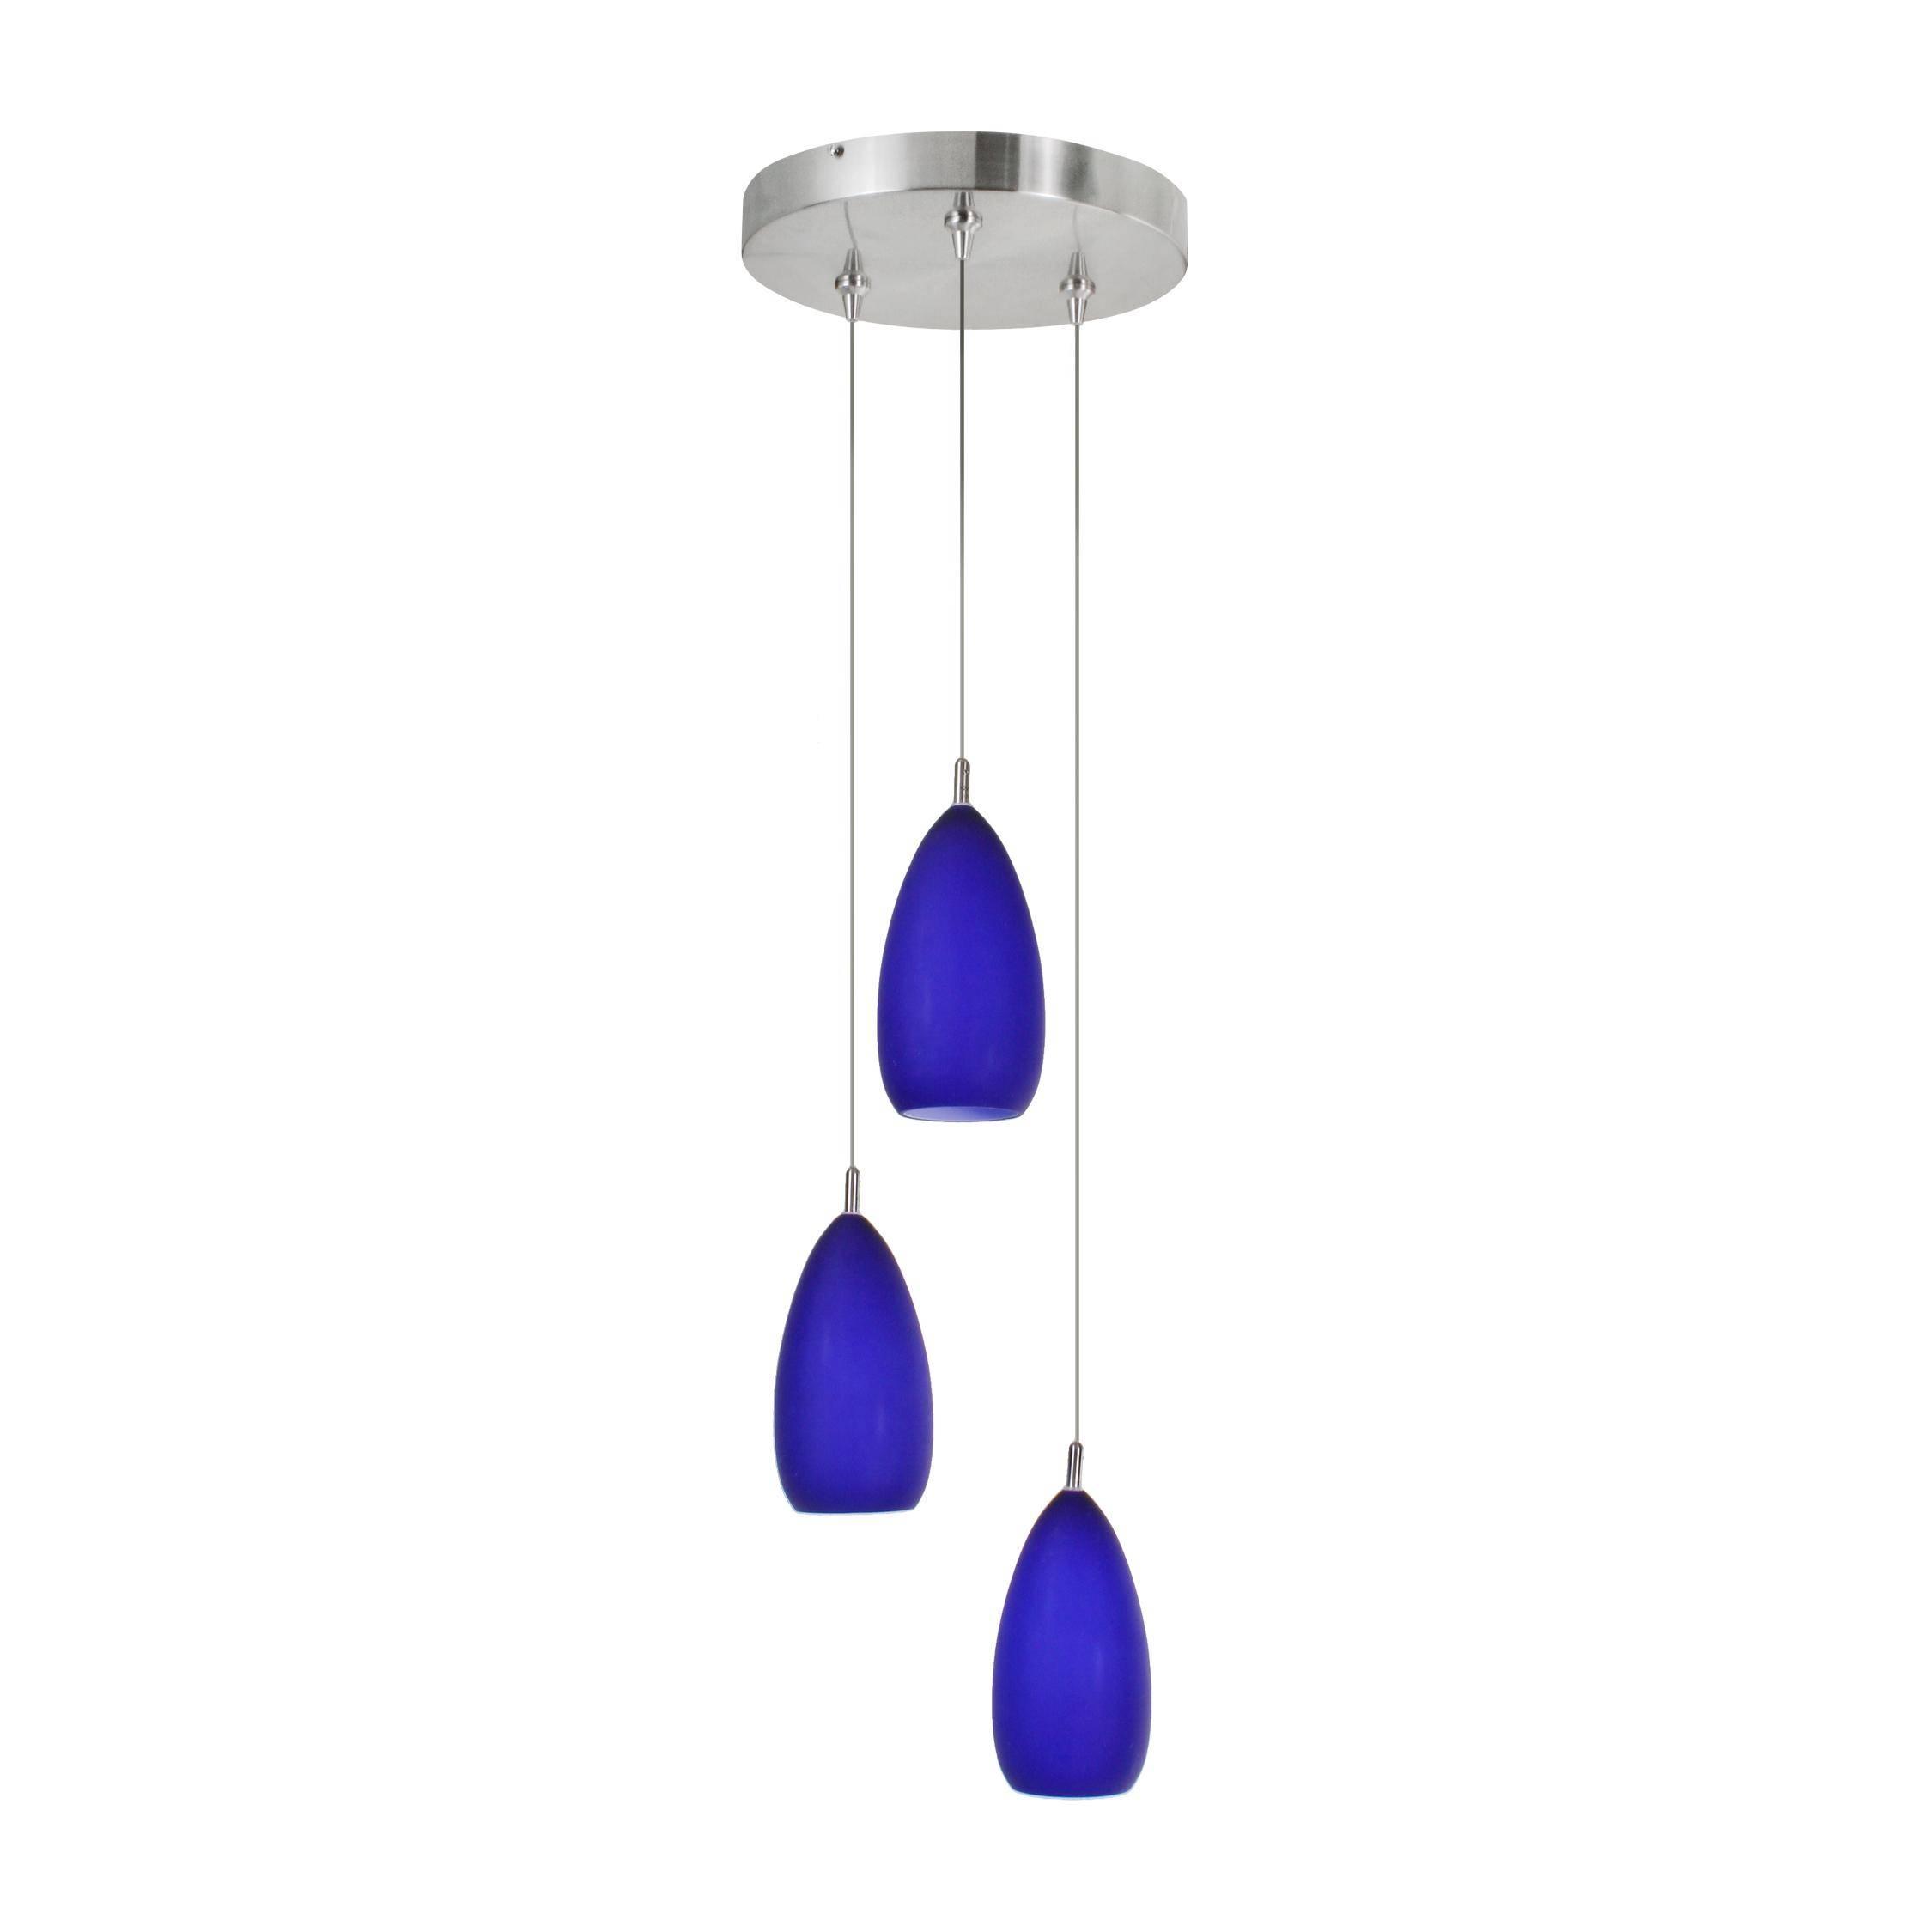 Blue Pendant Light Fixtures – Home Website Regarding Blue Pendant Light Fixtures (View 6 of 15)